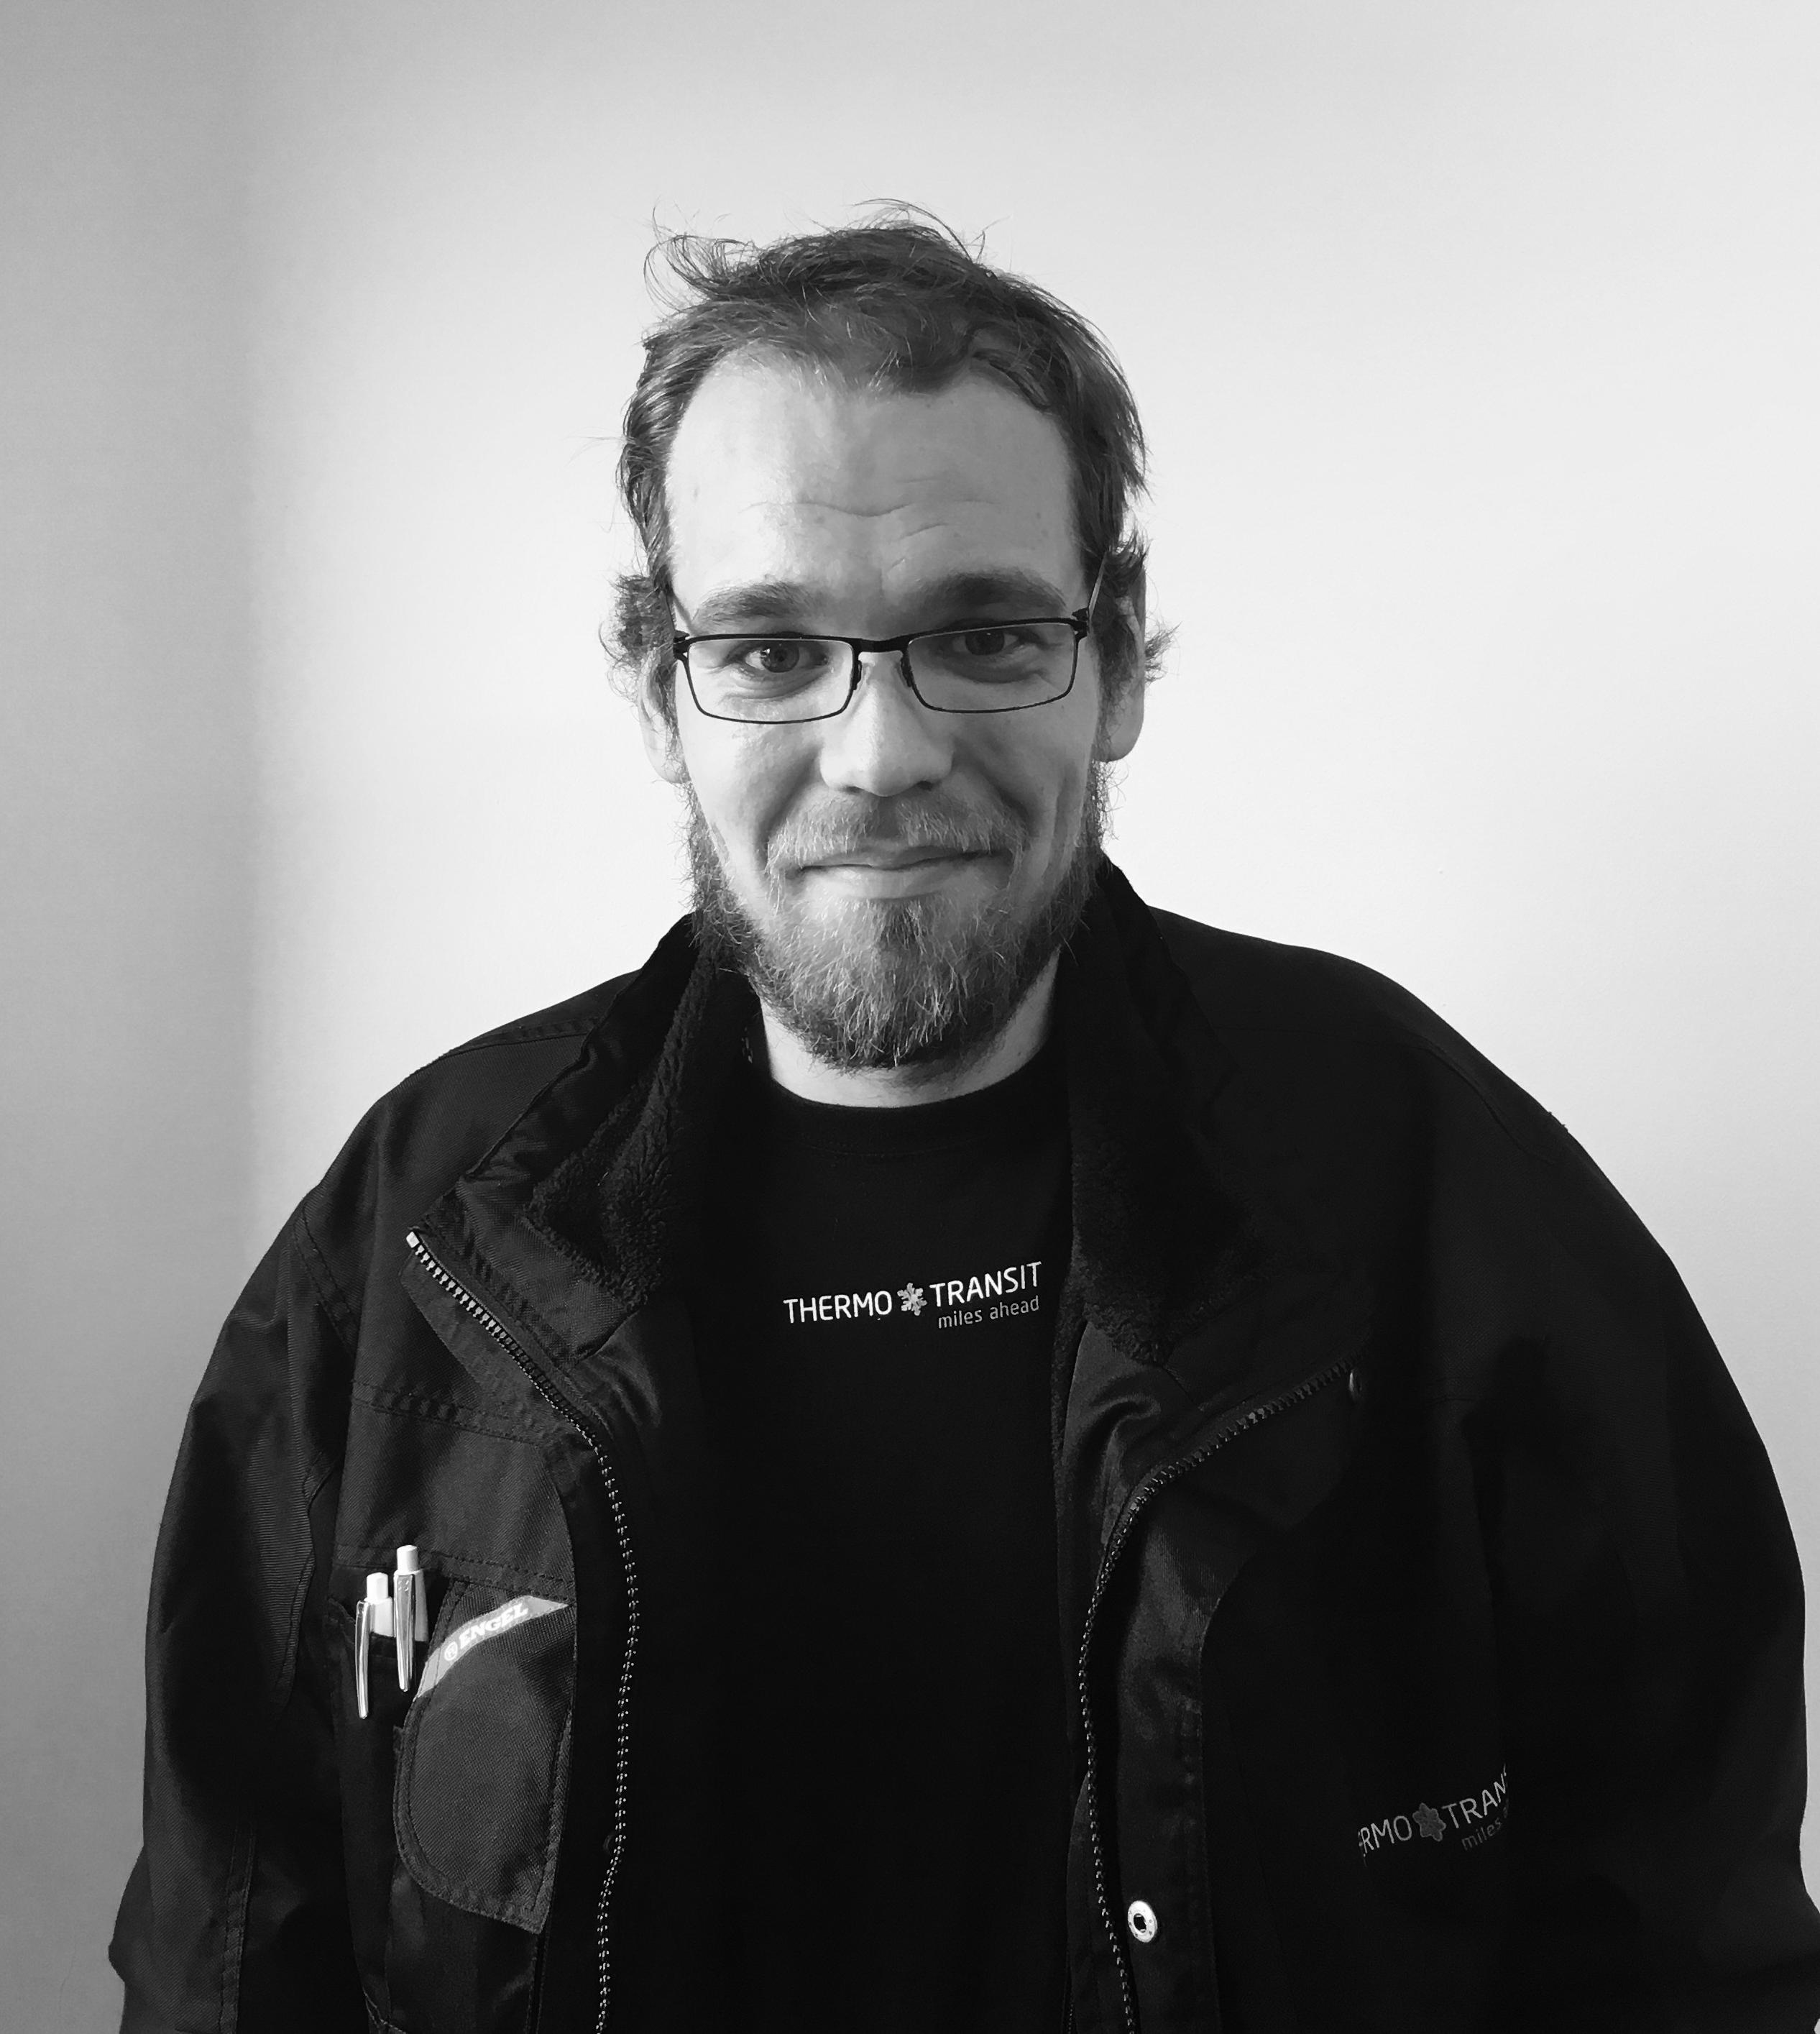 Daniel Bartels